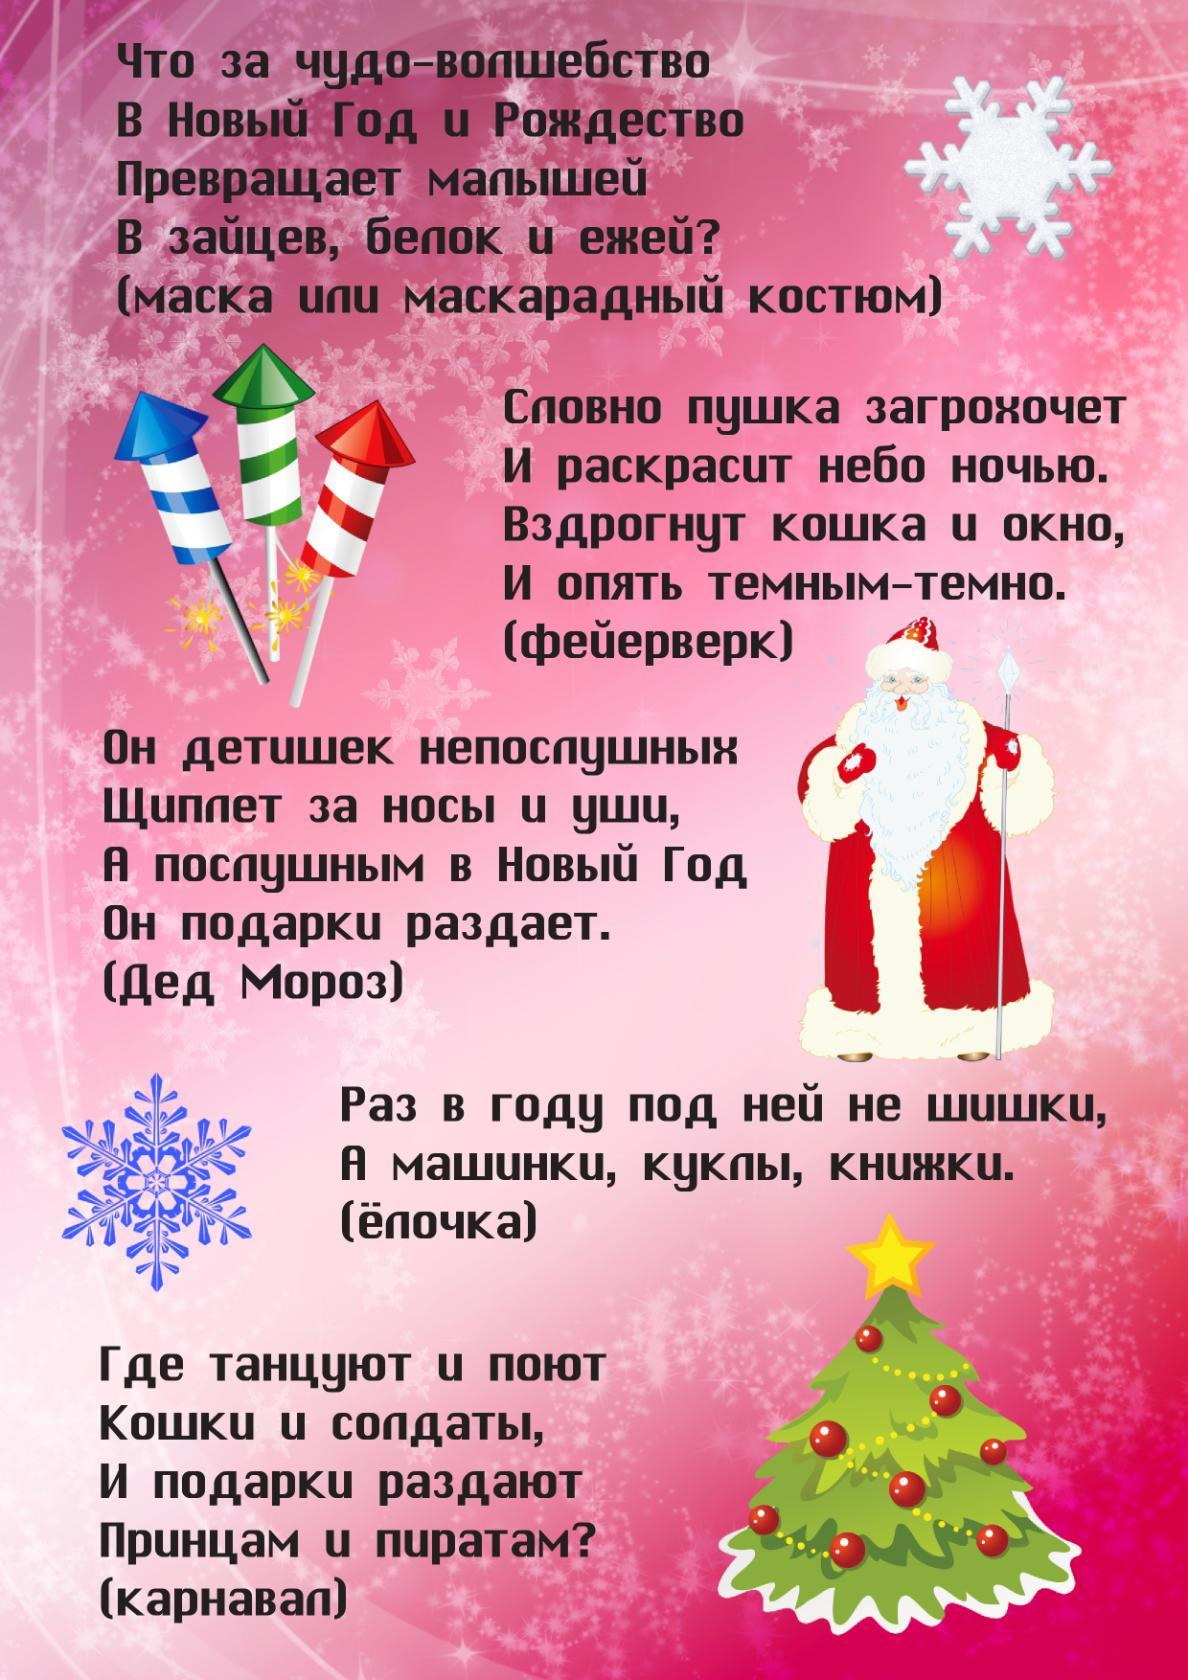 http://s3.uploads.ru/SWeh5.jpg